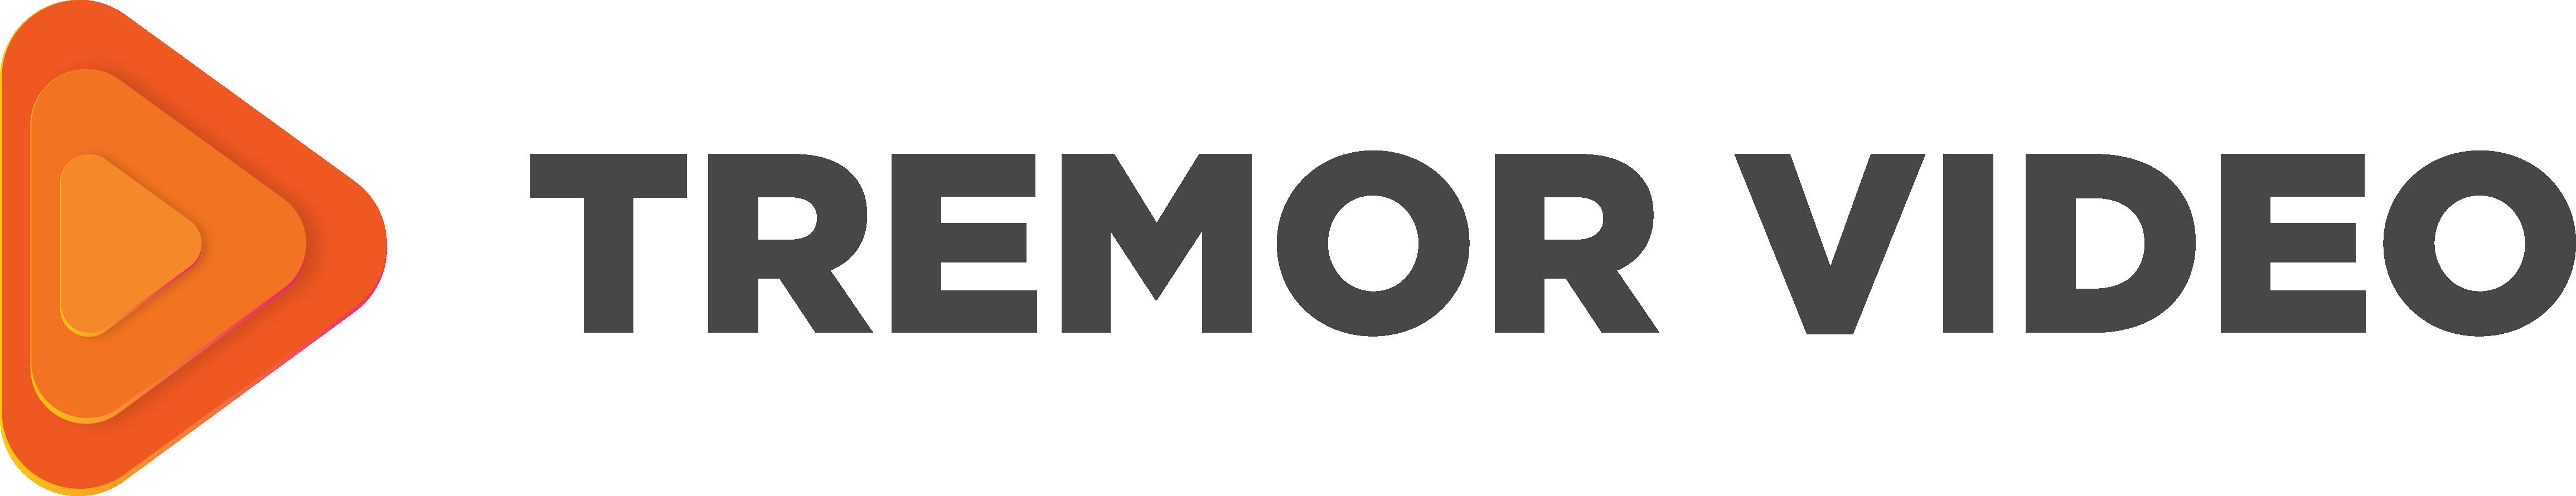 tremorvideo logo